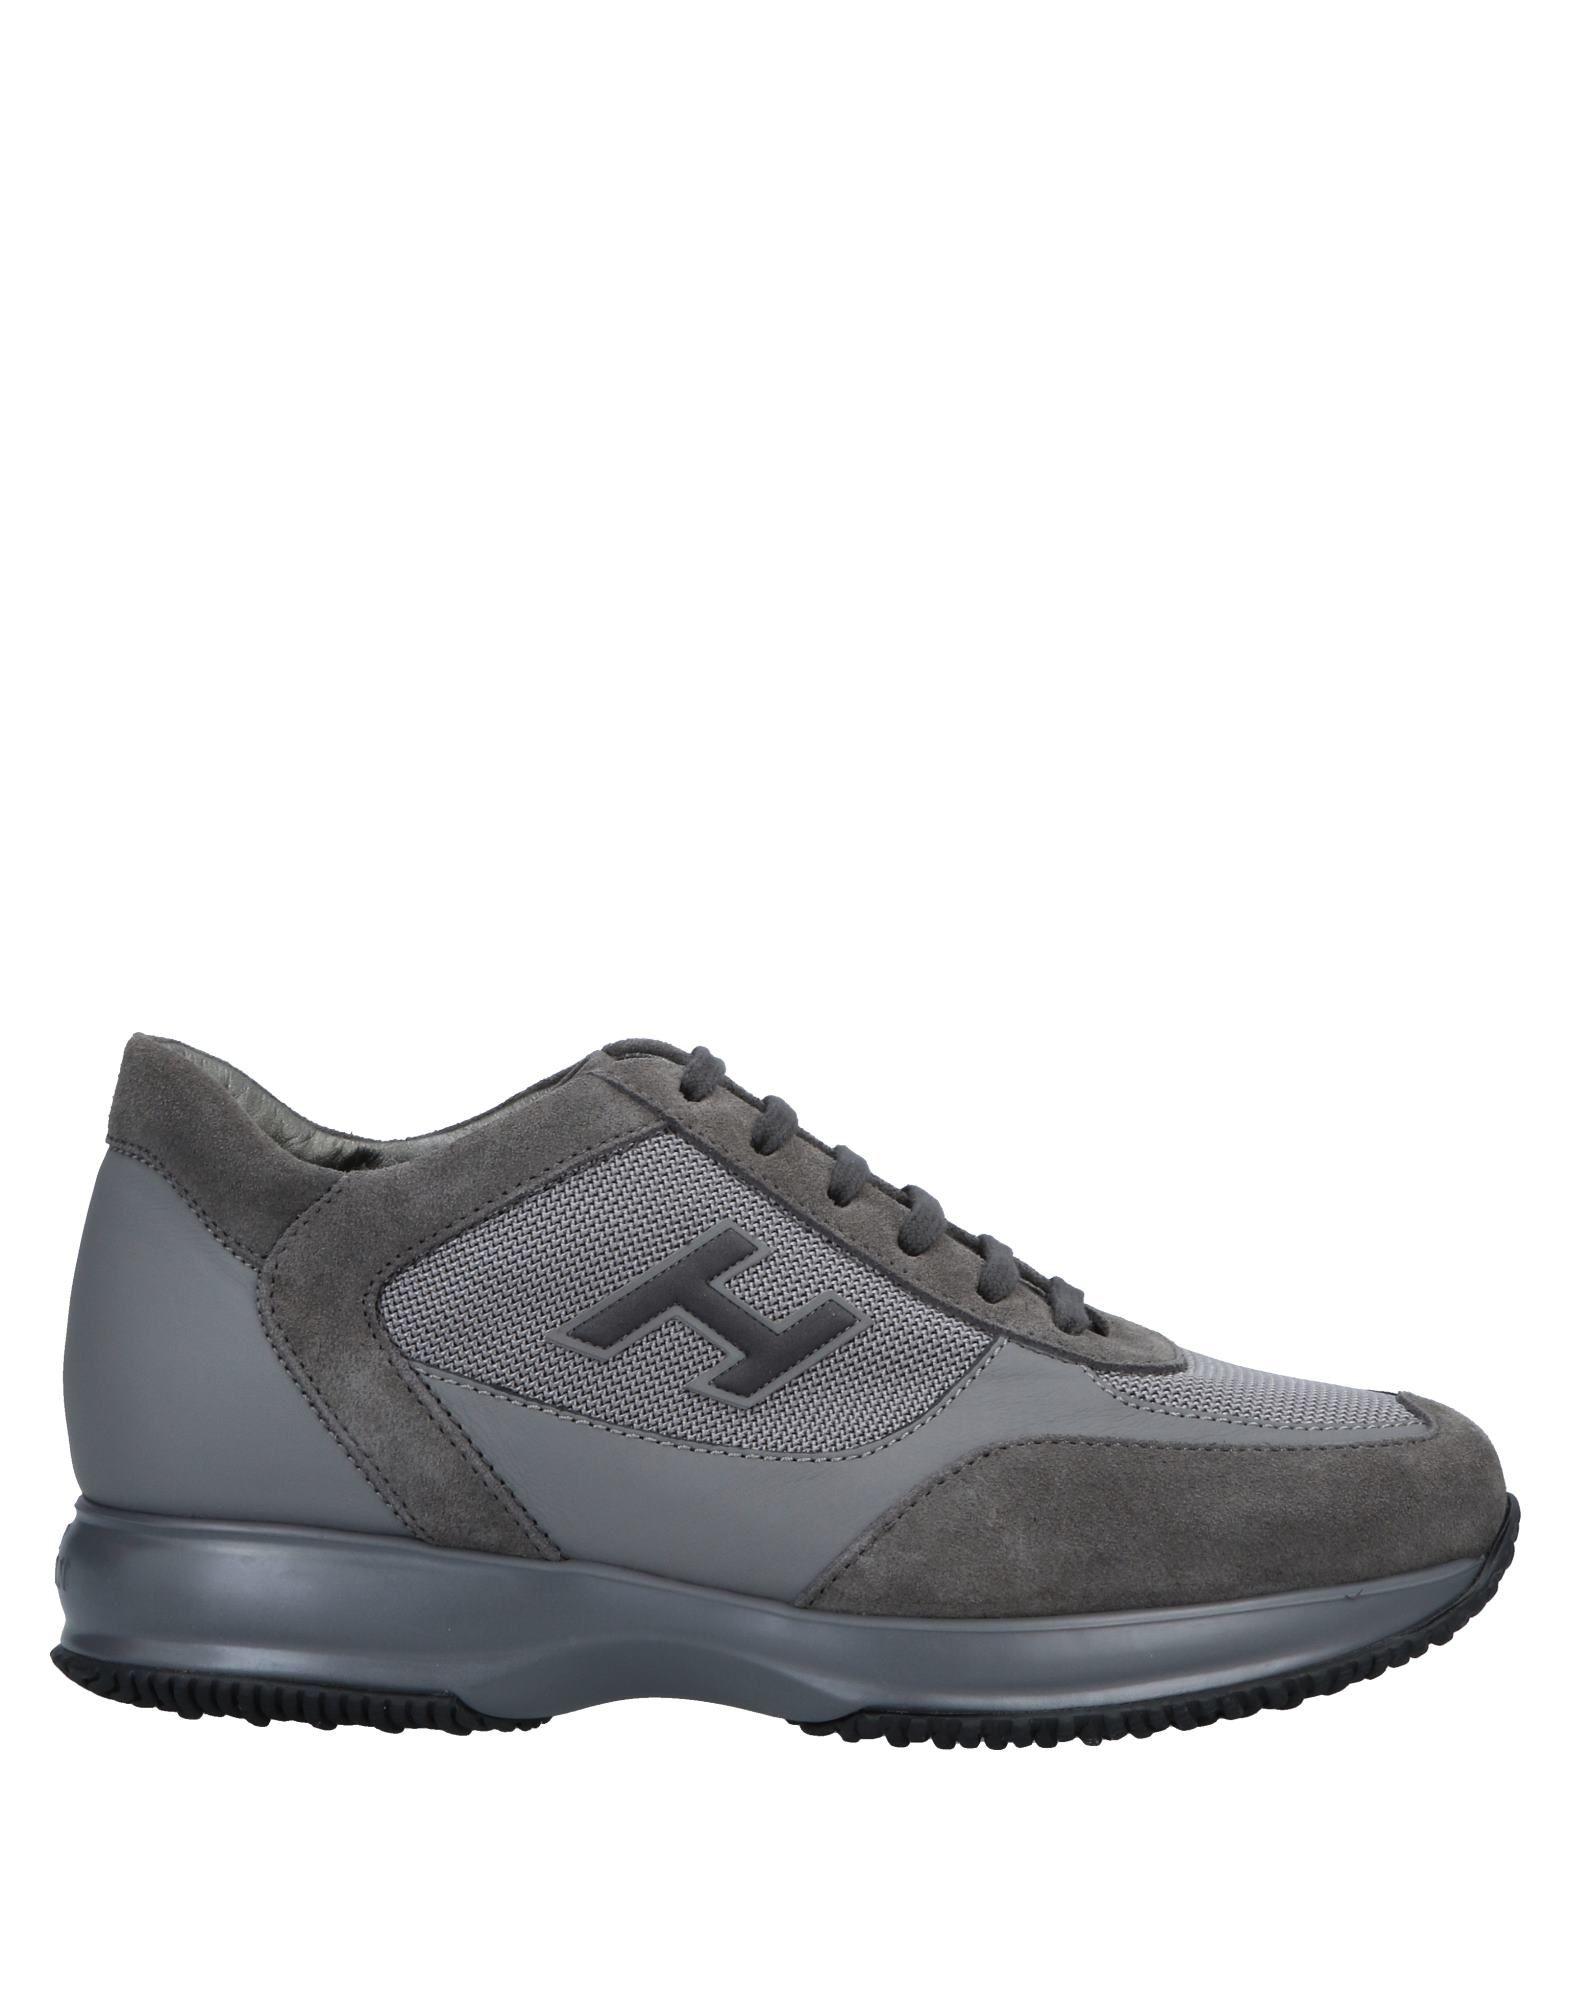 Hogan Sneakers Herren  11559746US Gute Qualität beliebte Schuhe